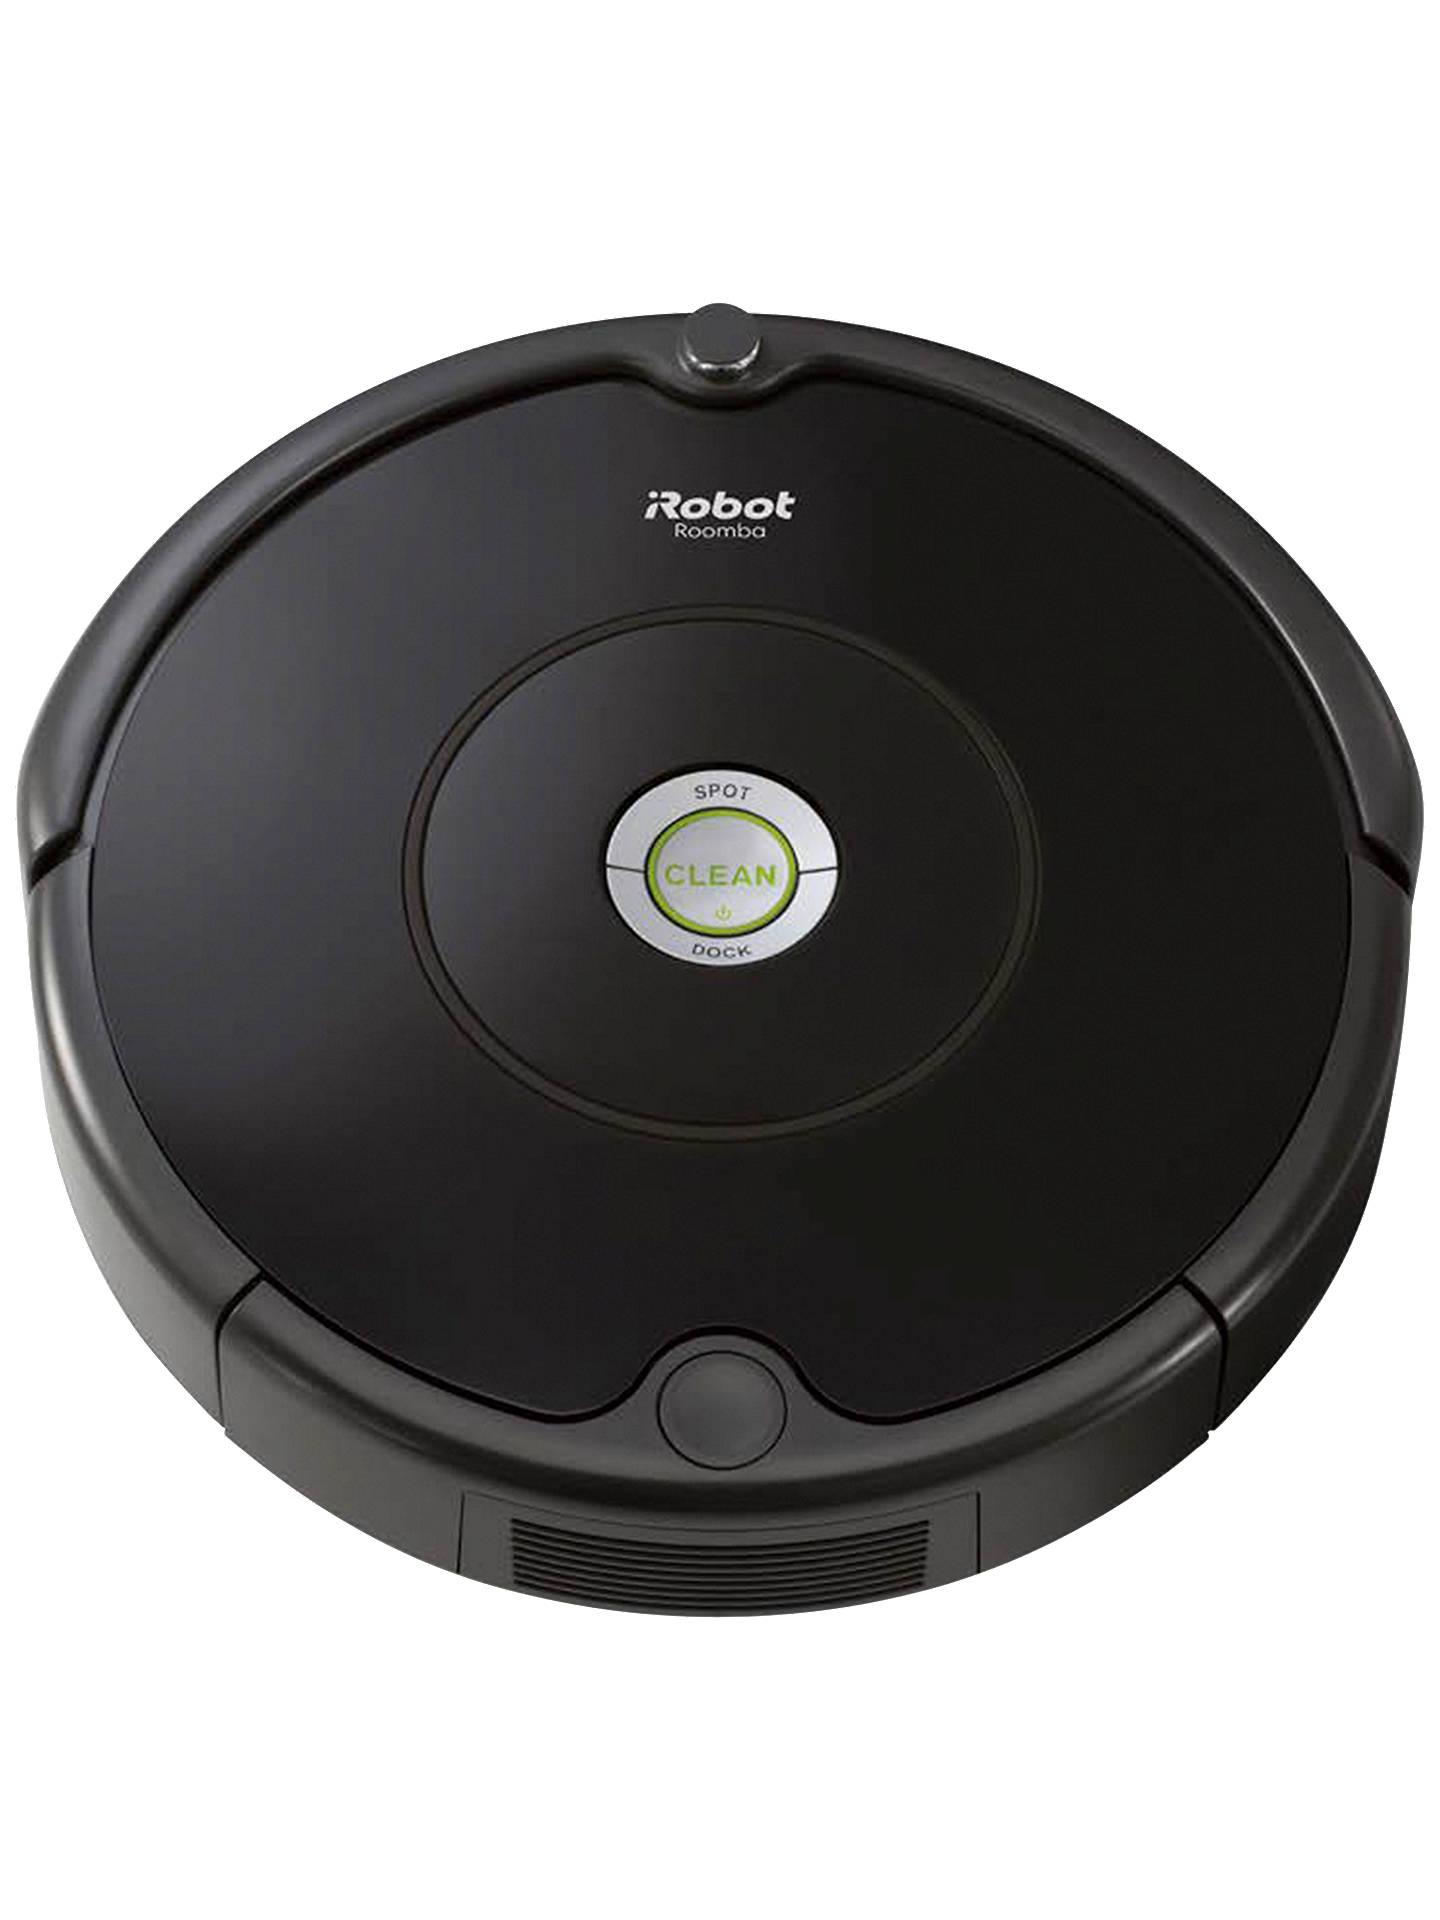 Irobot Roomba Robot Vacuum Cleaner Black John Lewis Amp Partners